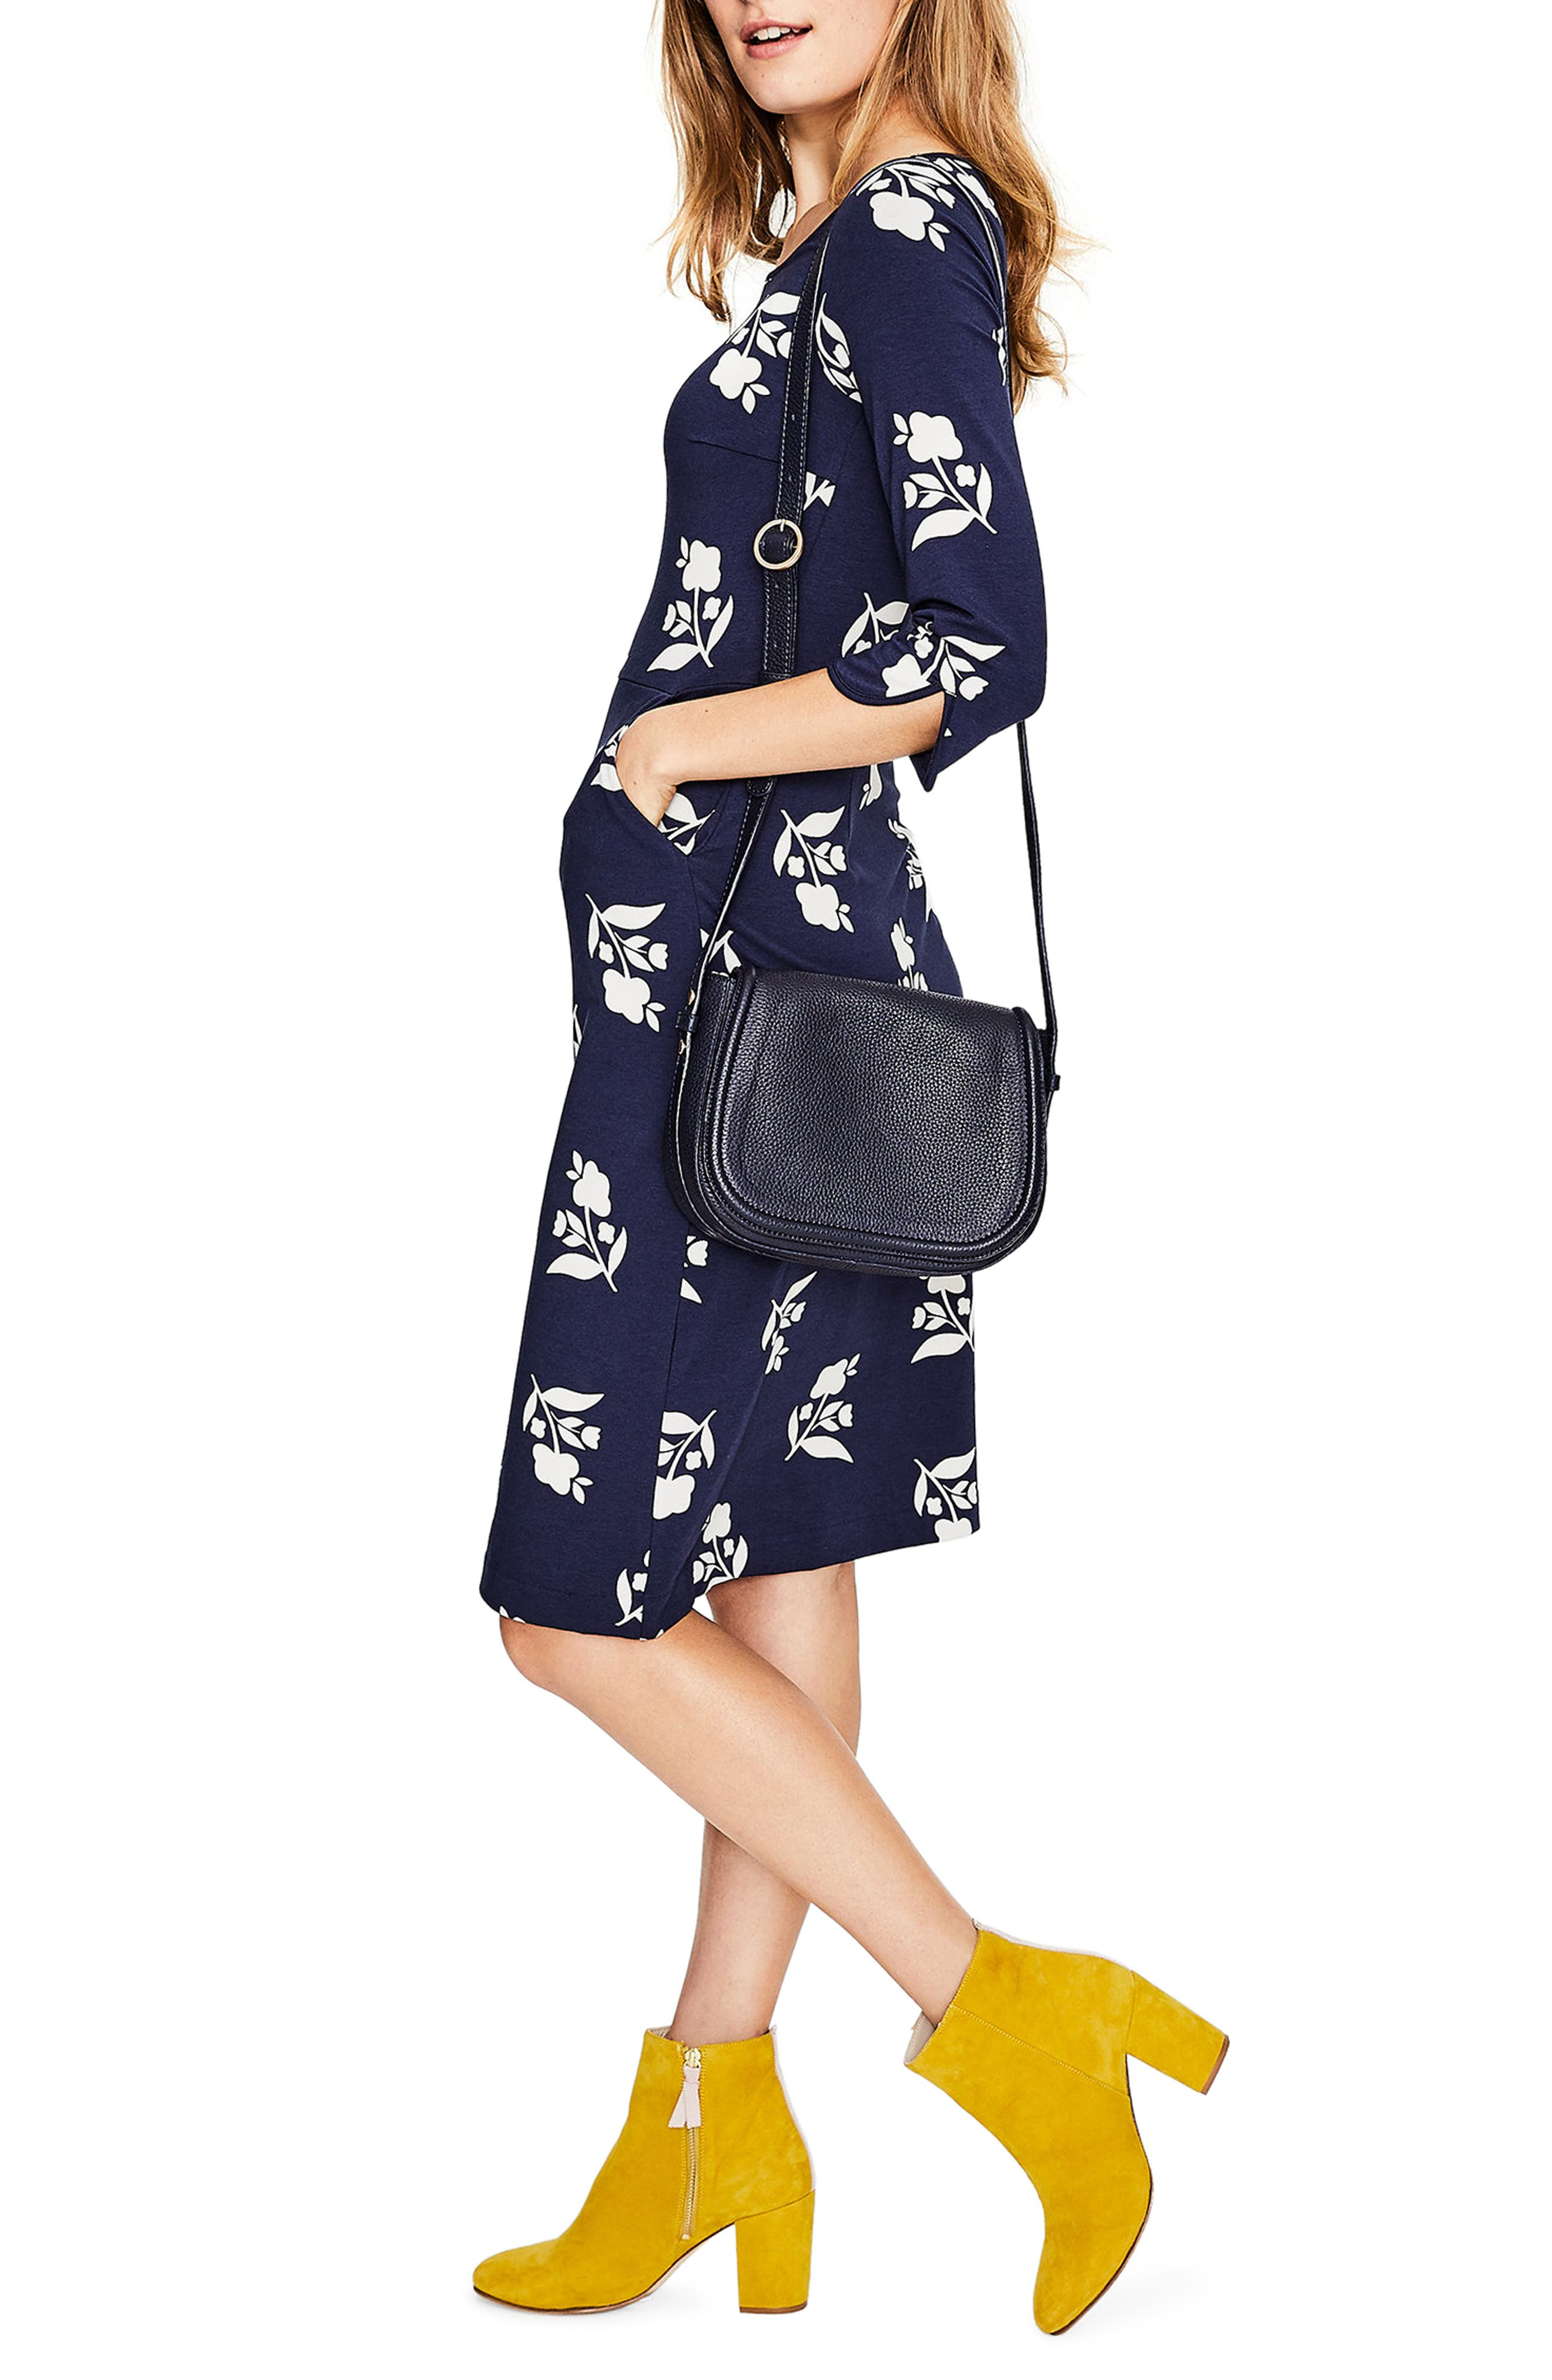 Jessie Jersey Floral Dress,                         Main,                         color, Navy Meadow Motif